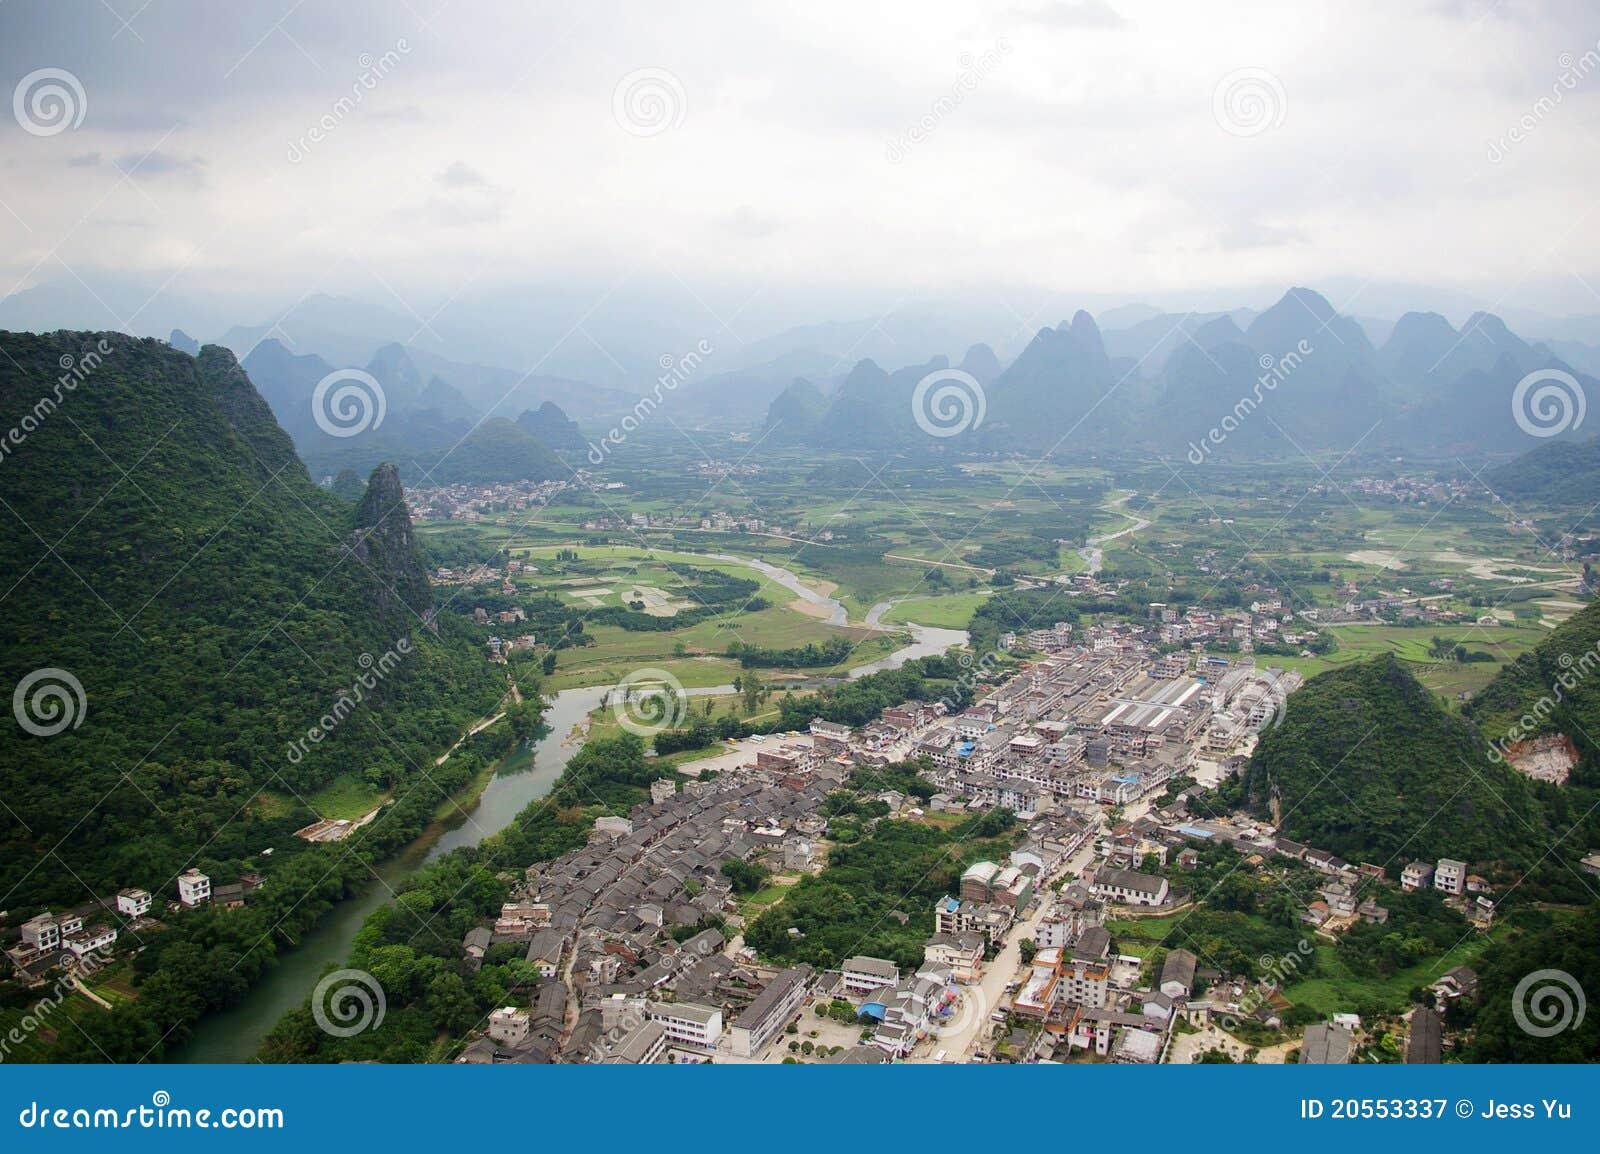 Beautiful Karst Mountain Landscape Royalty Free Stock Photography ...